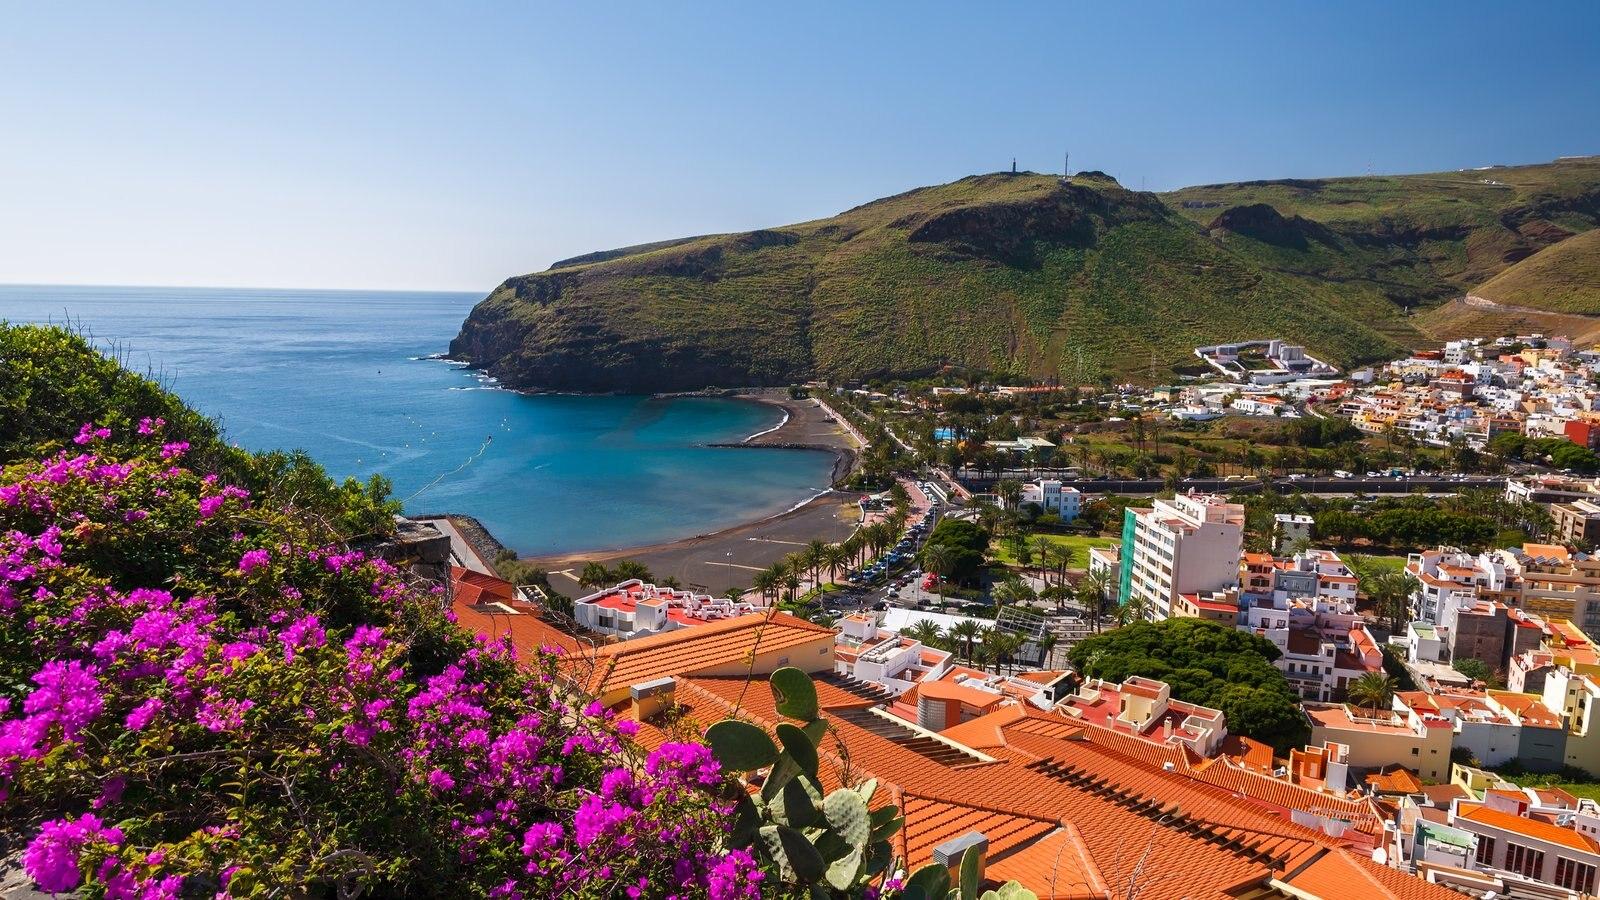 La Gomera showing a coastal town, general coastal views and landscape views